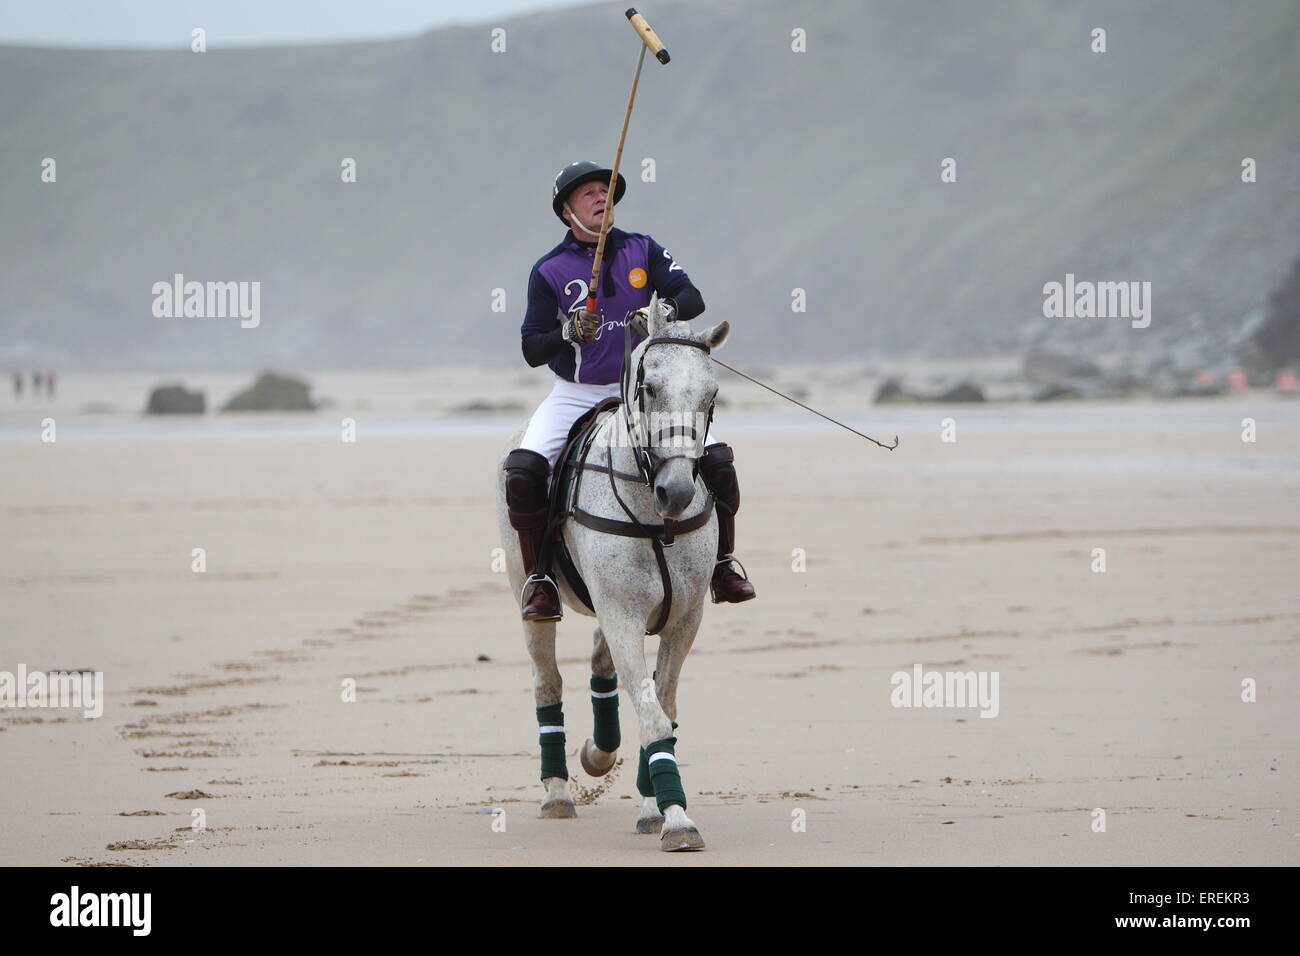 Watergate Bay, Newquay, Cornwall, UK. 2. Juni 2015. Professionelle Polospieler Andy Burgess Tonka Praktiken am Strand Stockbild